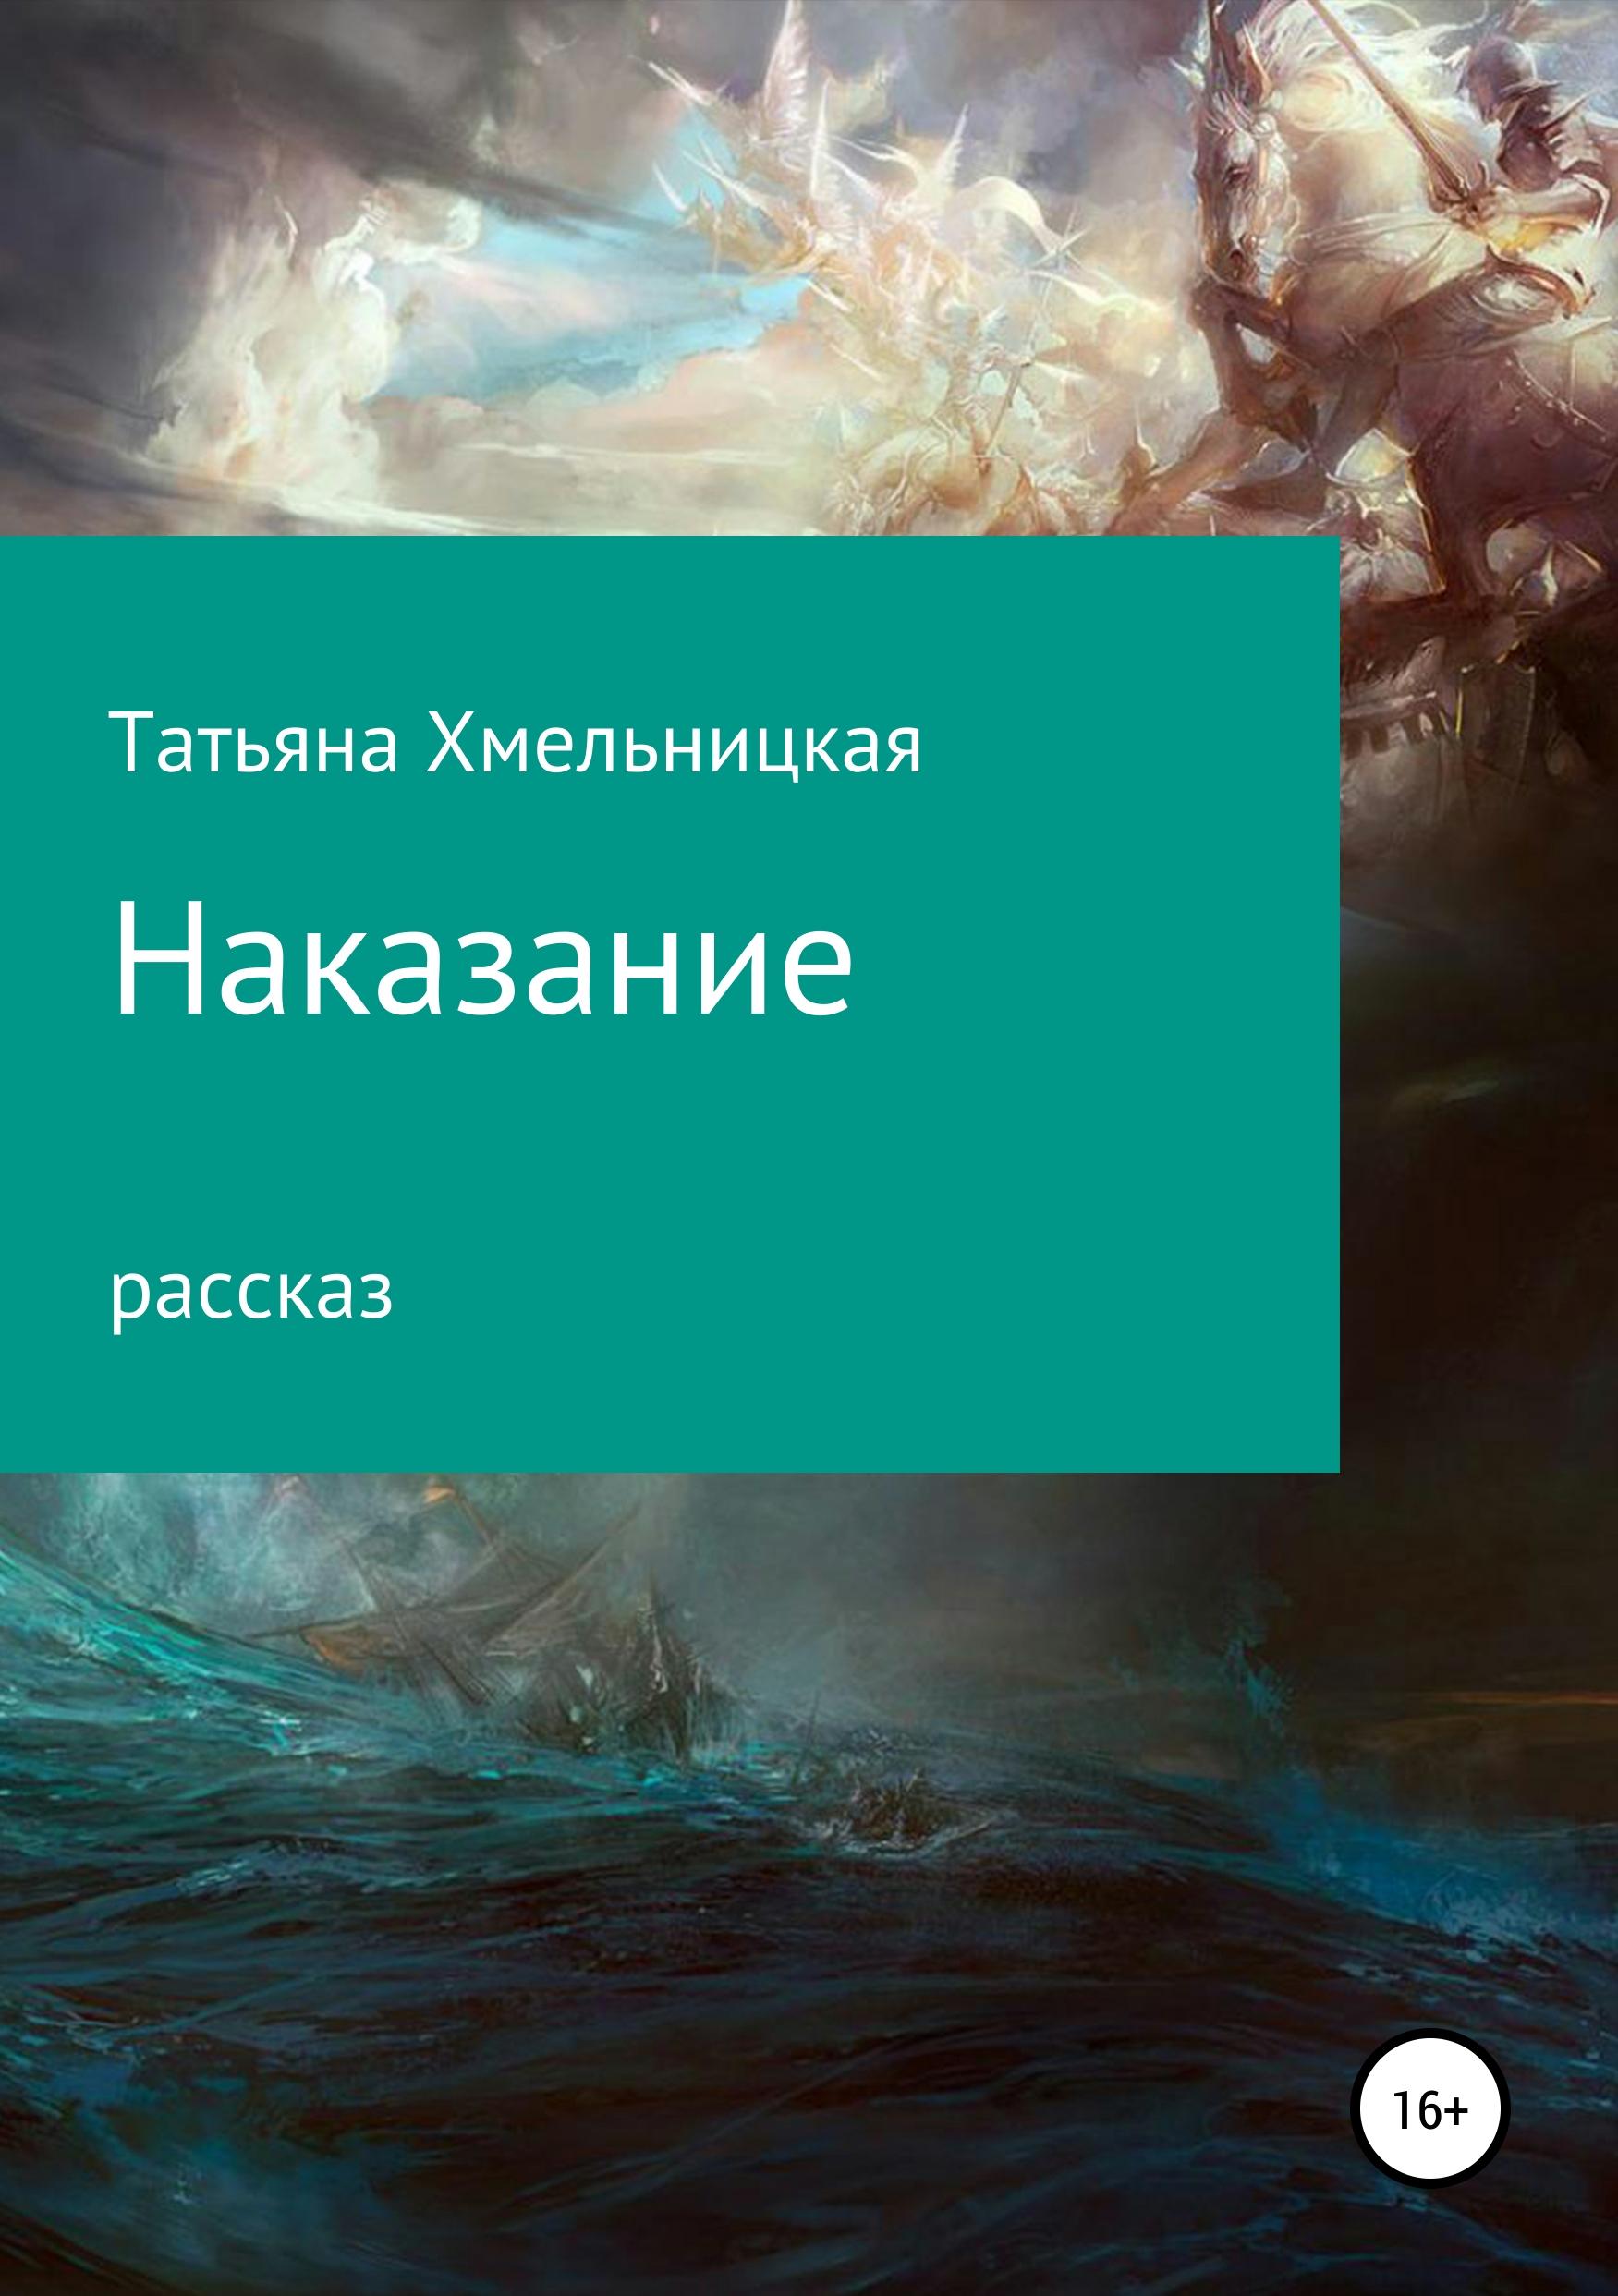 Татьяна Хмельницкая Наказание татьяна хмельницкая агент